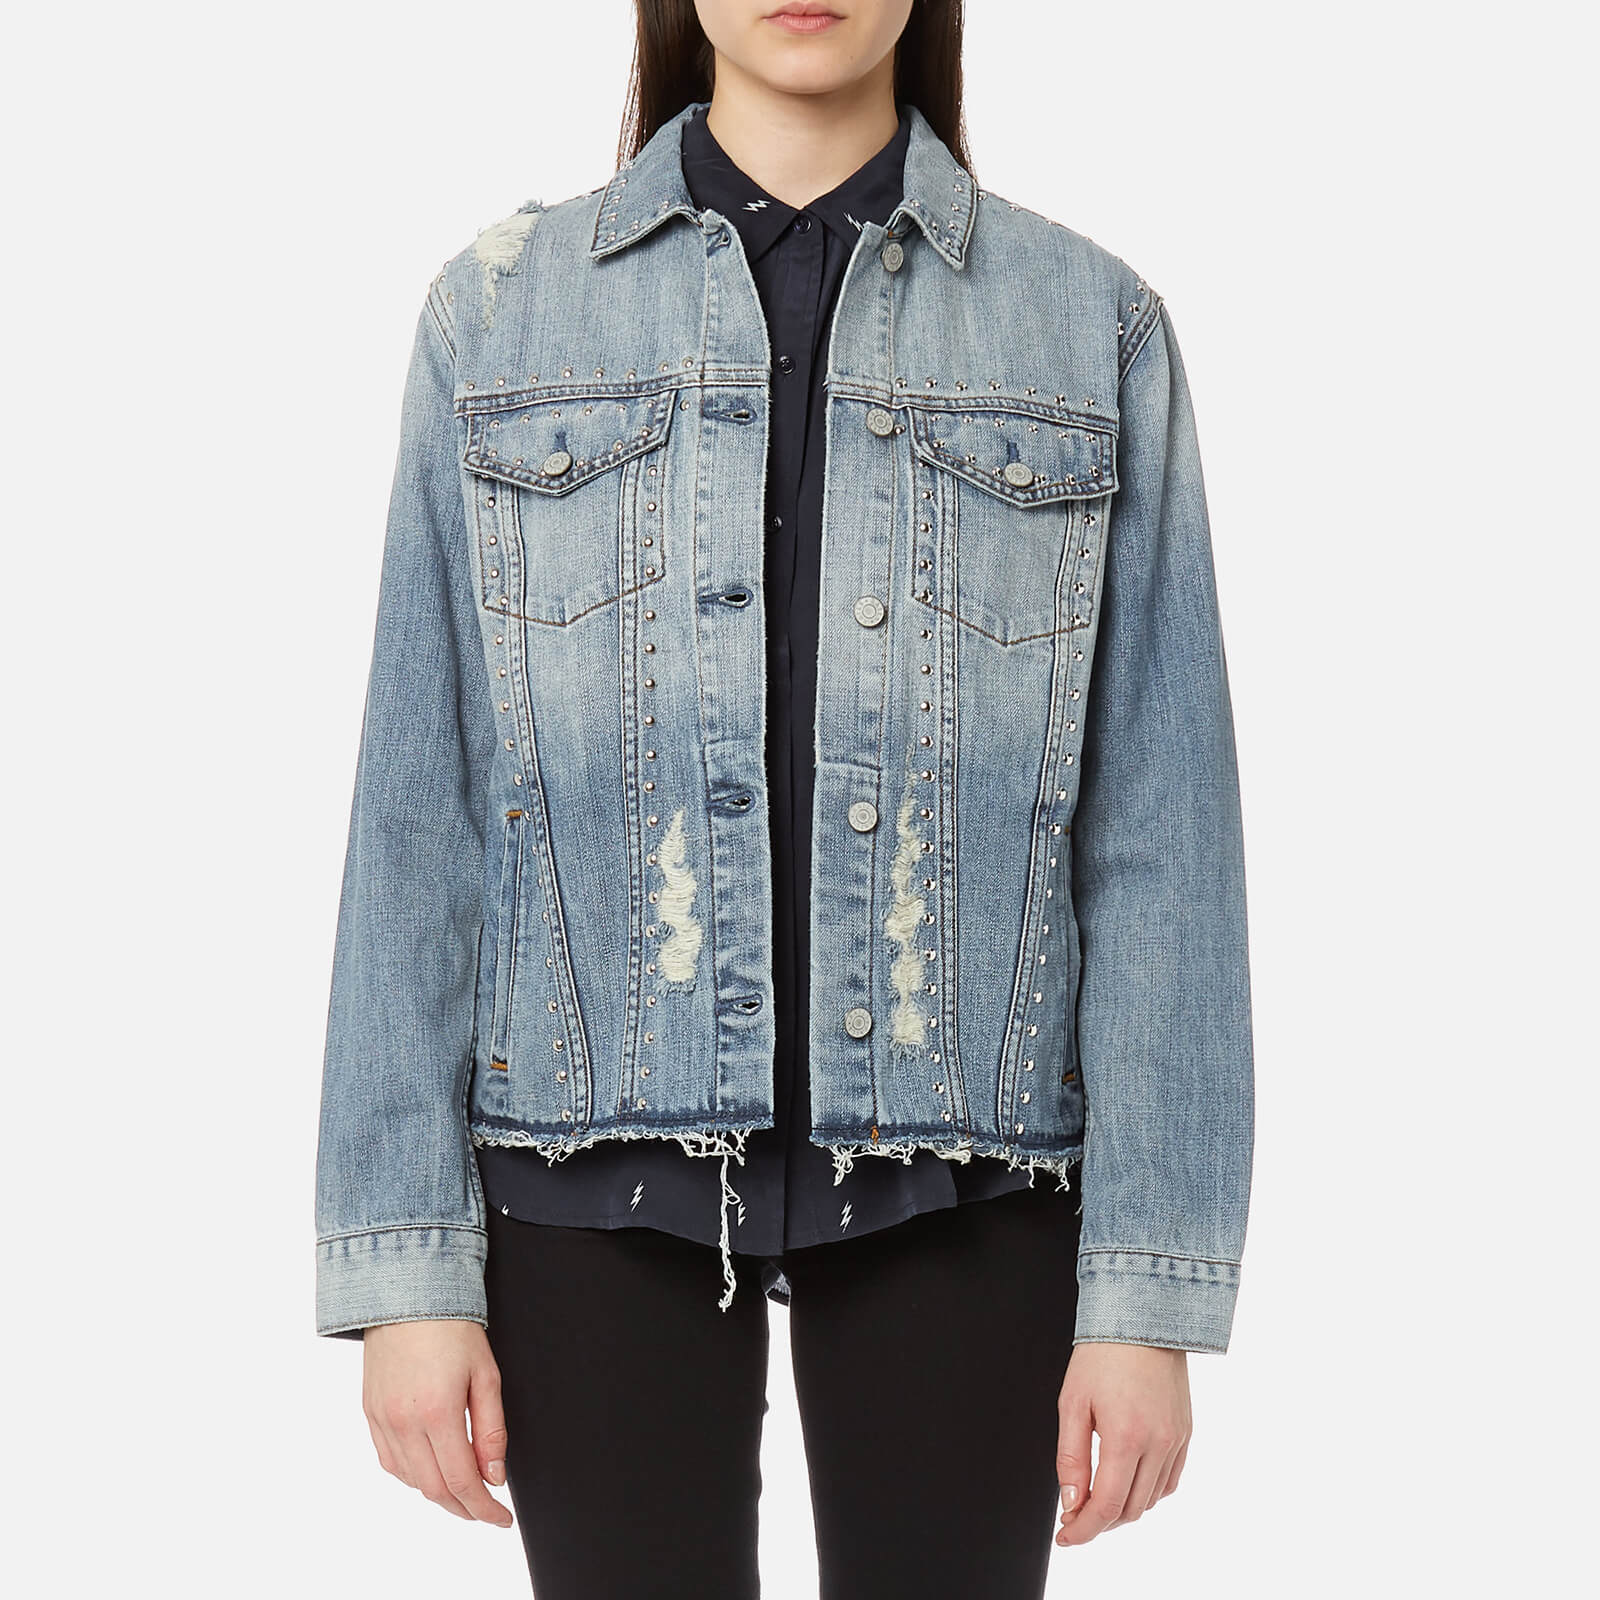 fc1b1fcb39 Rails Women s Knox Studded Denim Shirt Jacket with Studs - Medium Vintage - Free  UK Delivery over £50